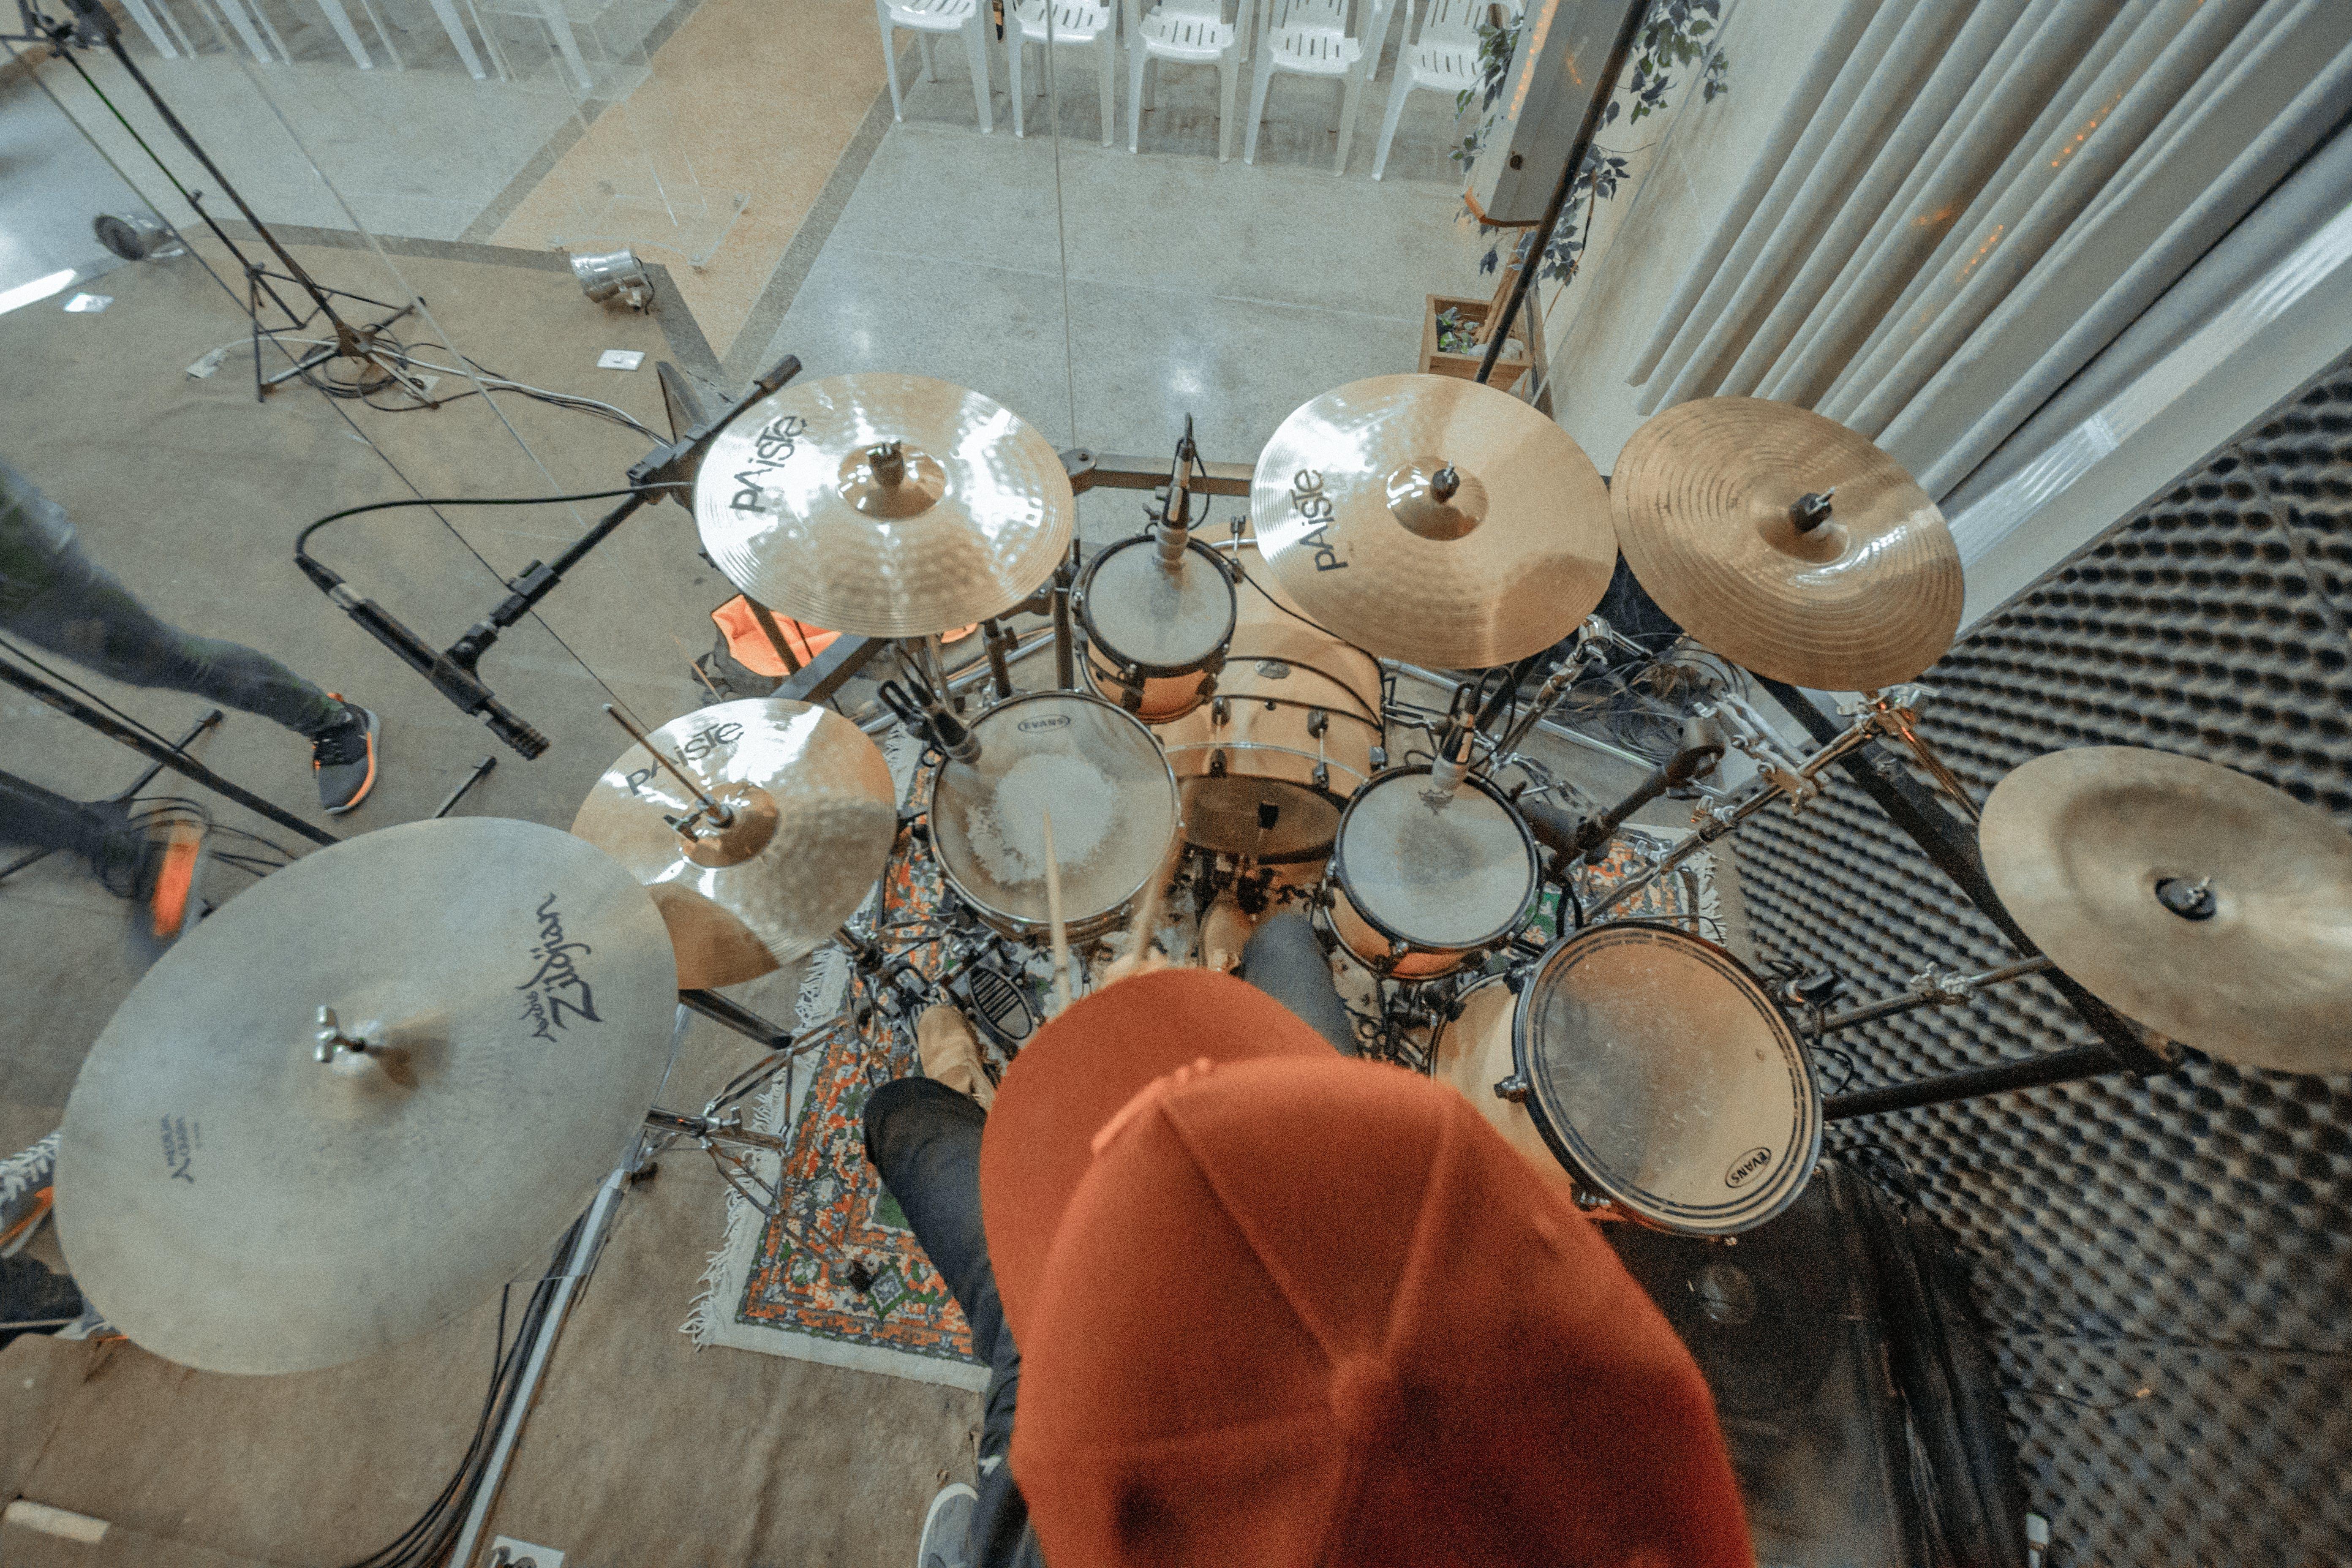 Gratis lagerfoto af bateria, baterista, lund, lyd